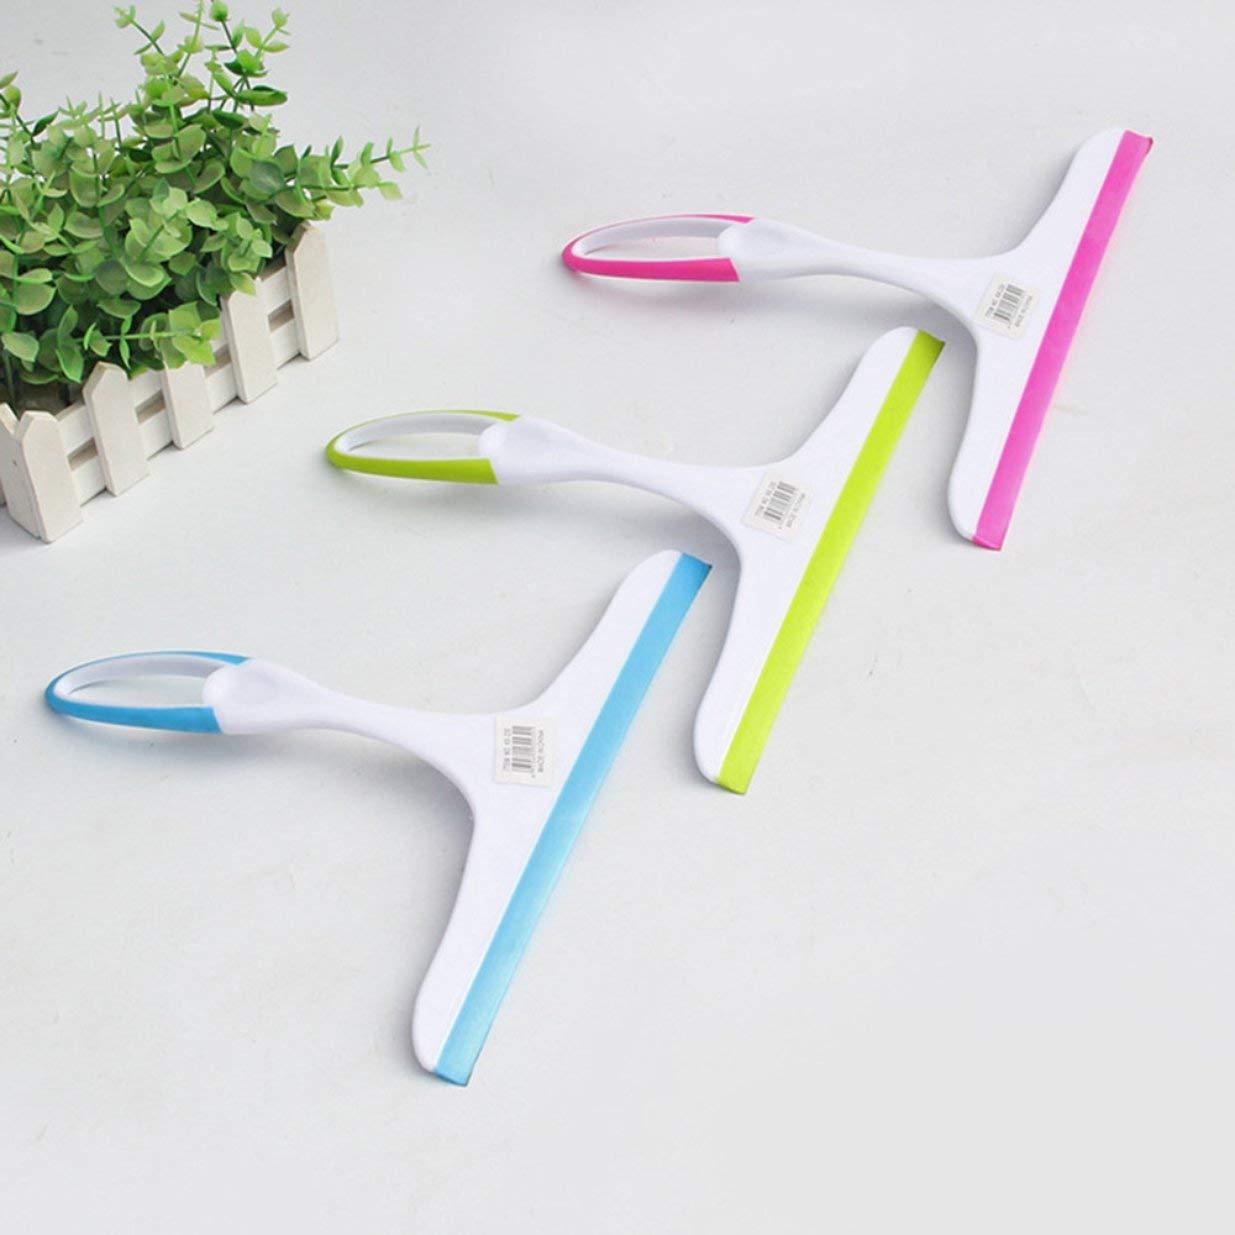 Lightweight Sleek Squeegee Simple Plastic Glass Cleaner Glass Cleaner Bathroom Wall Cleaner Window Glass Scraper Random